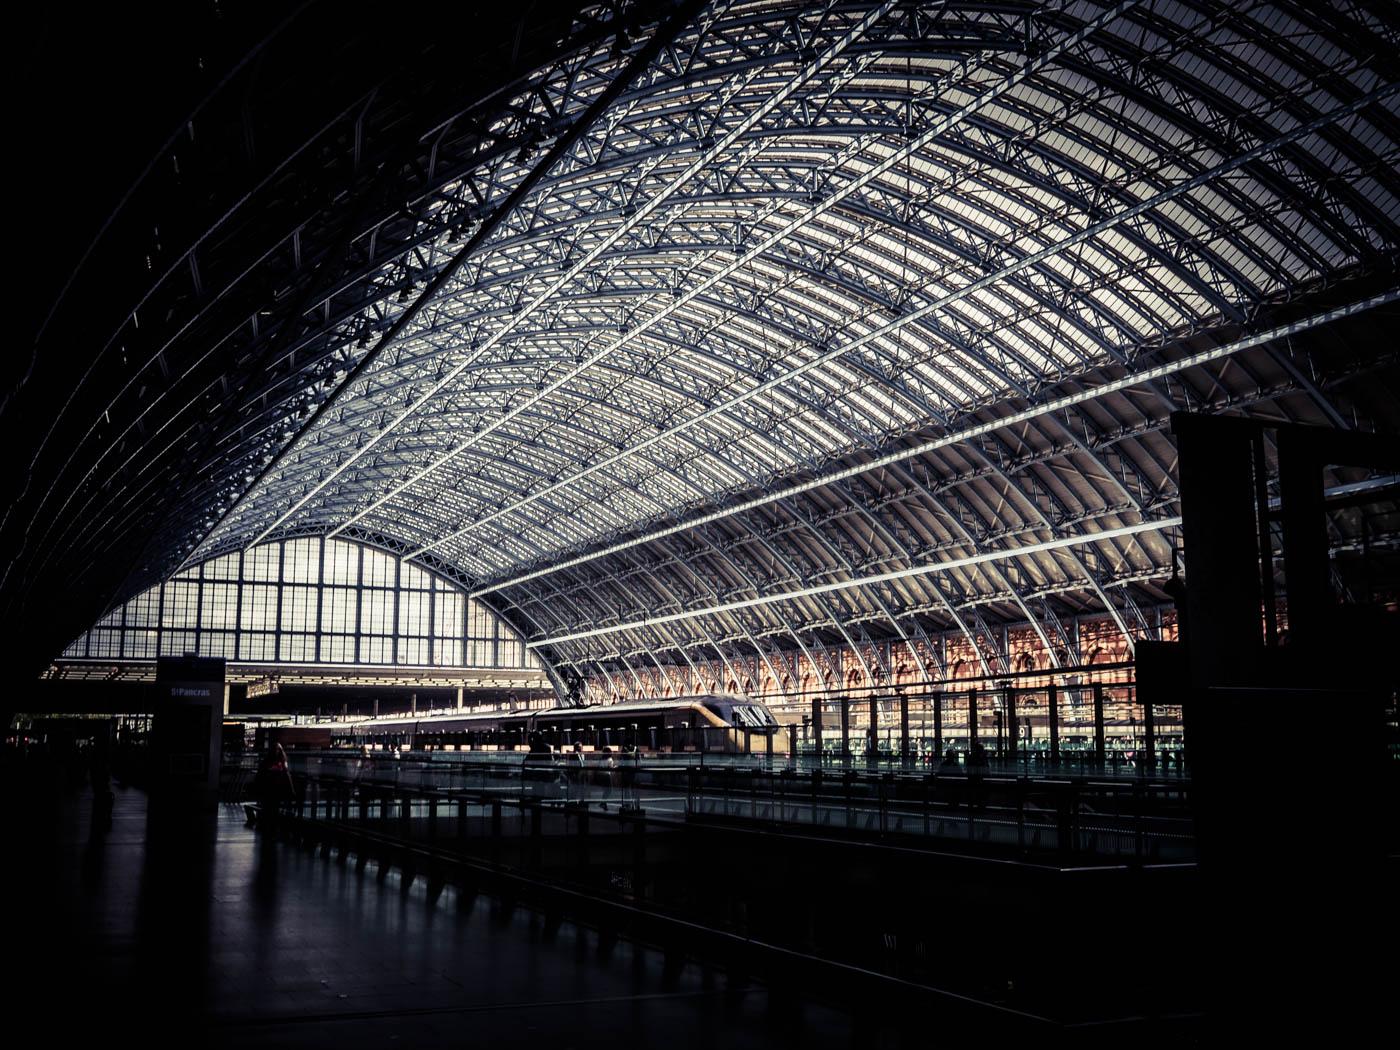 Bahnhof - St. Pancras Station